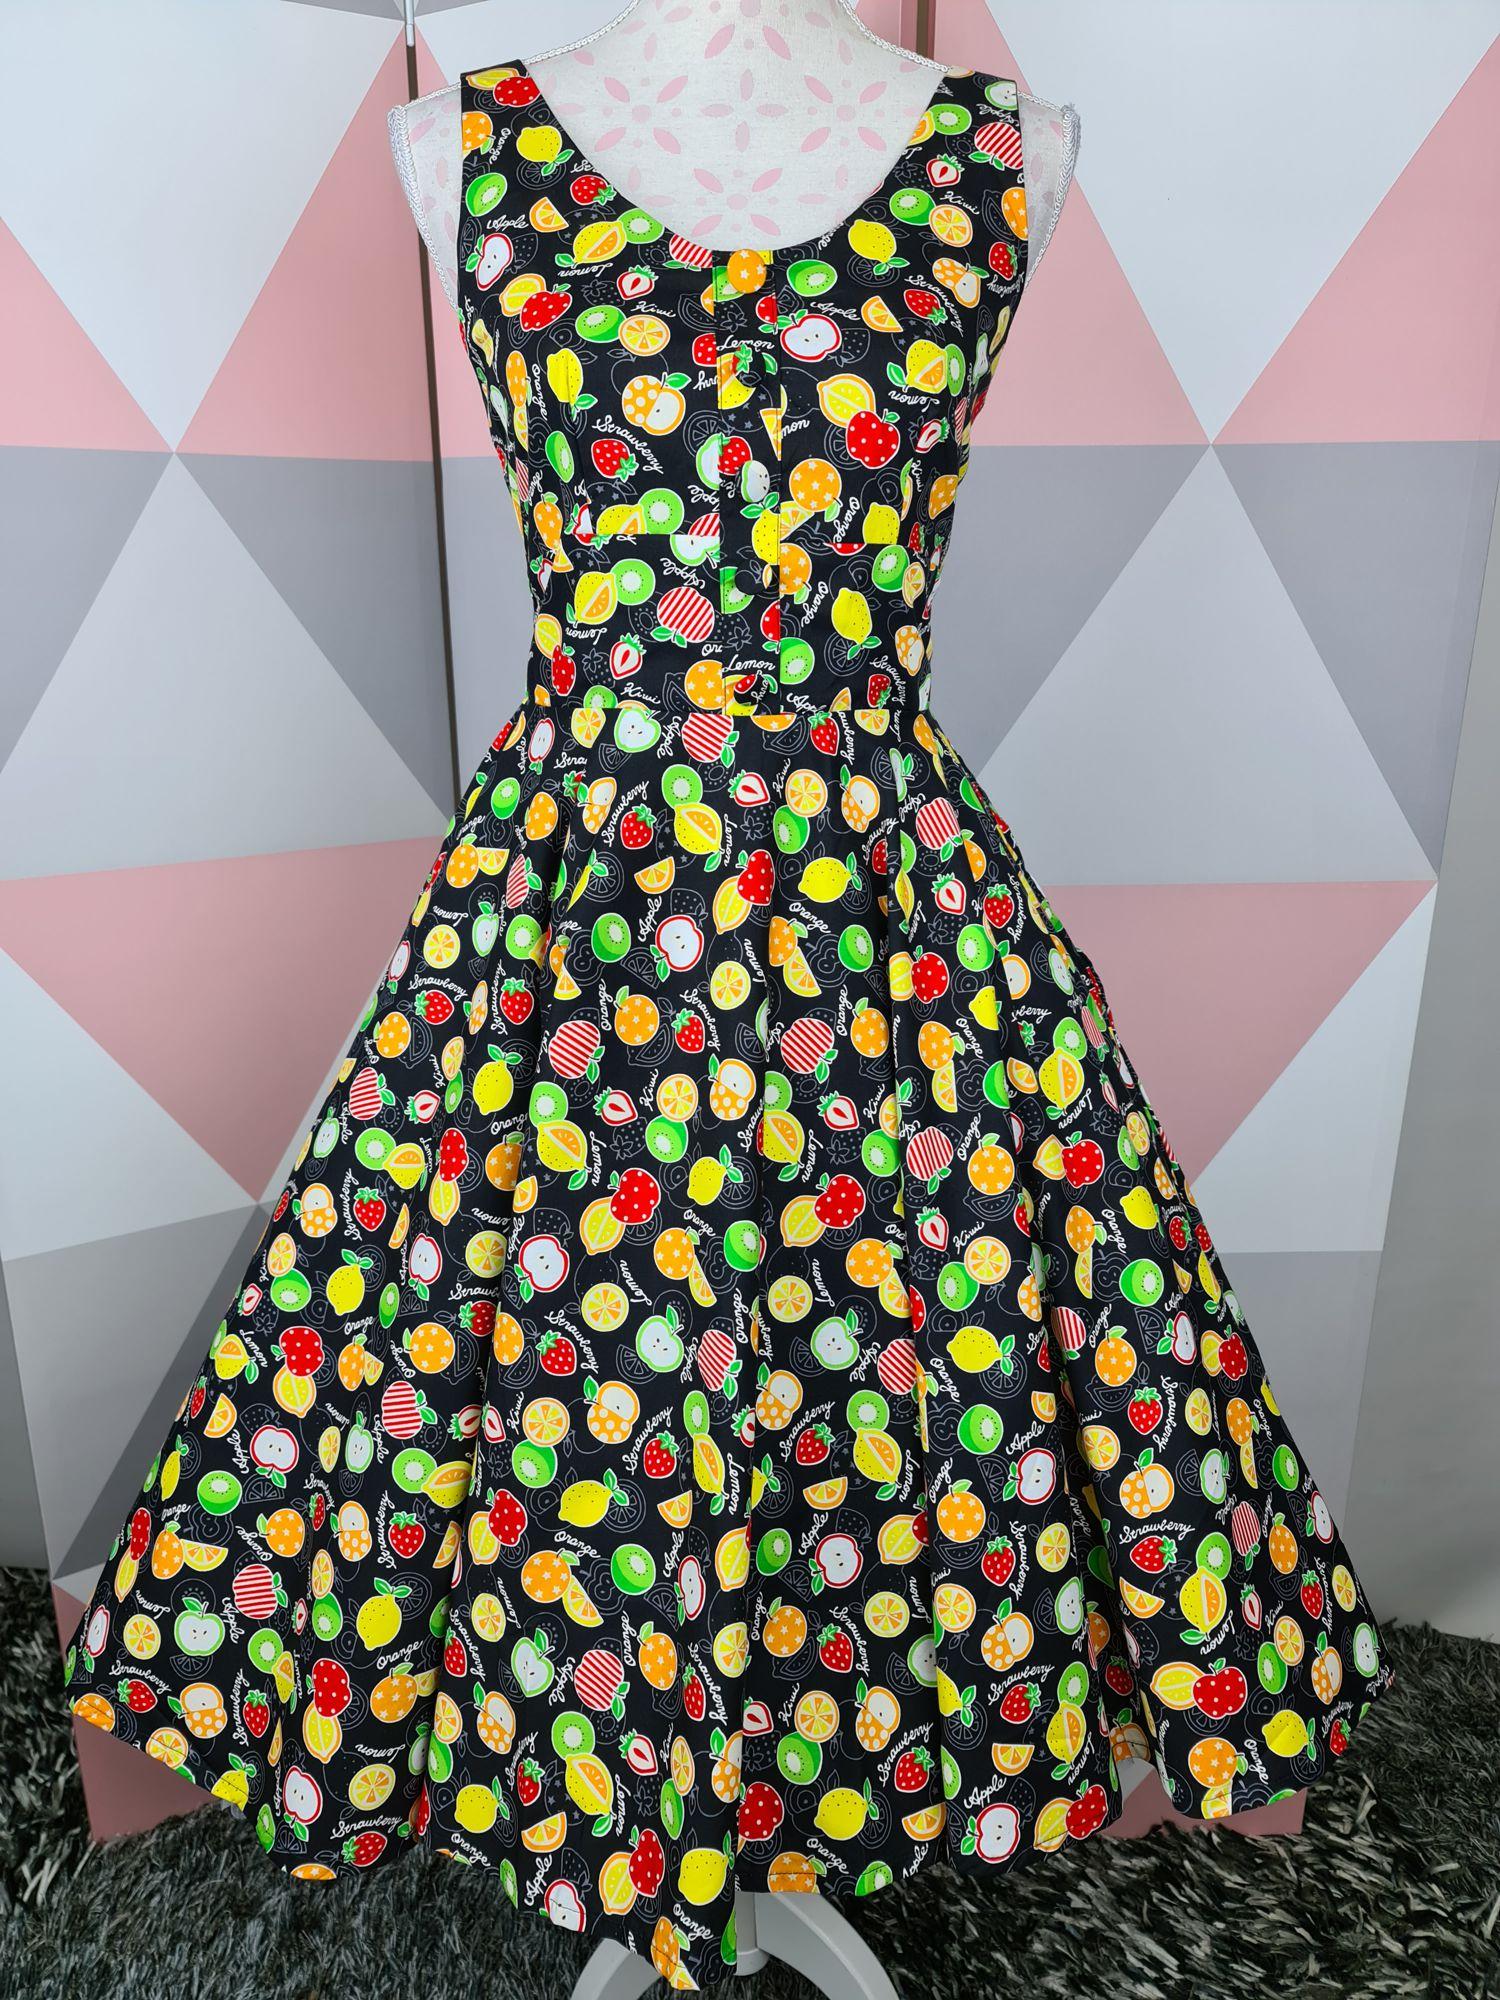 BEDR017b_robe-pinup-retro-50-s-rockabilly-swing-tutti-frutti